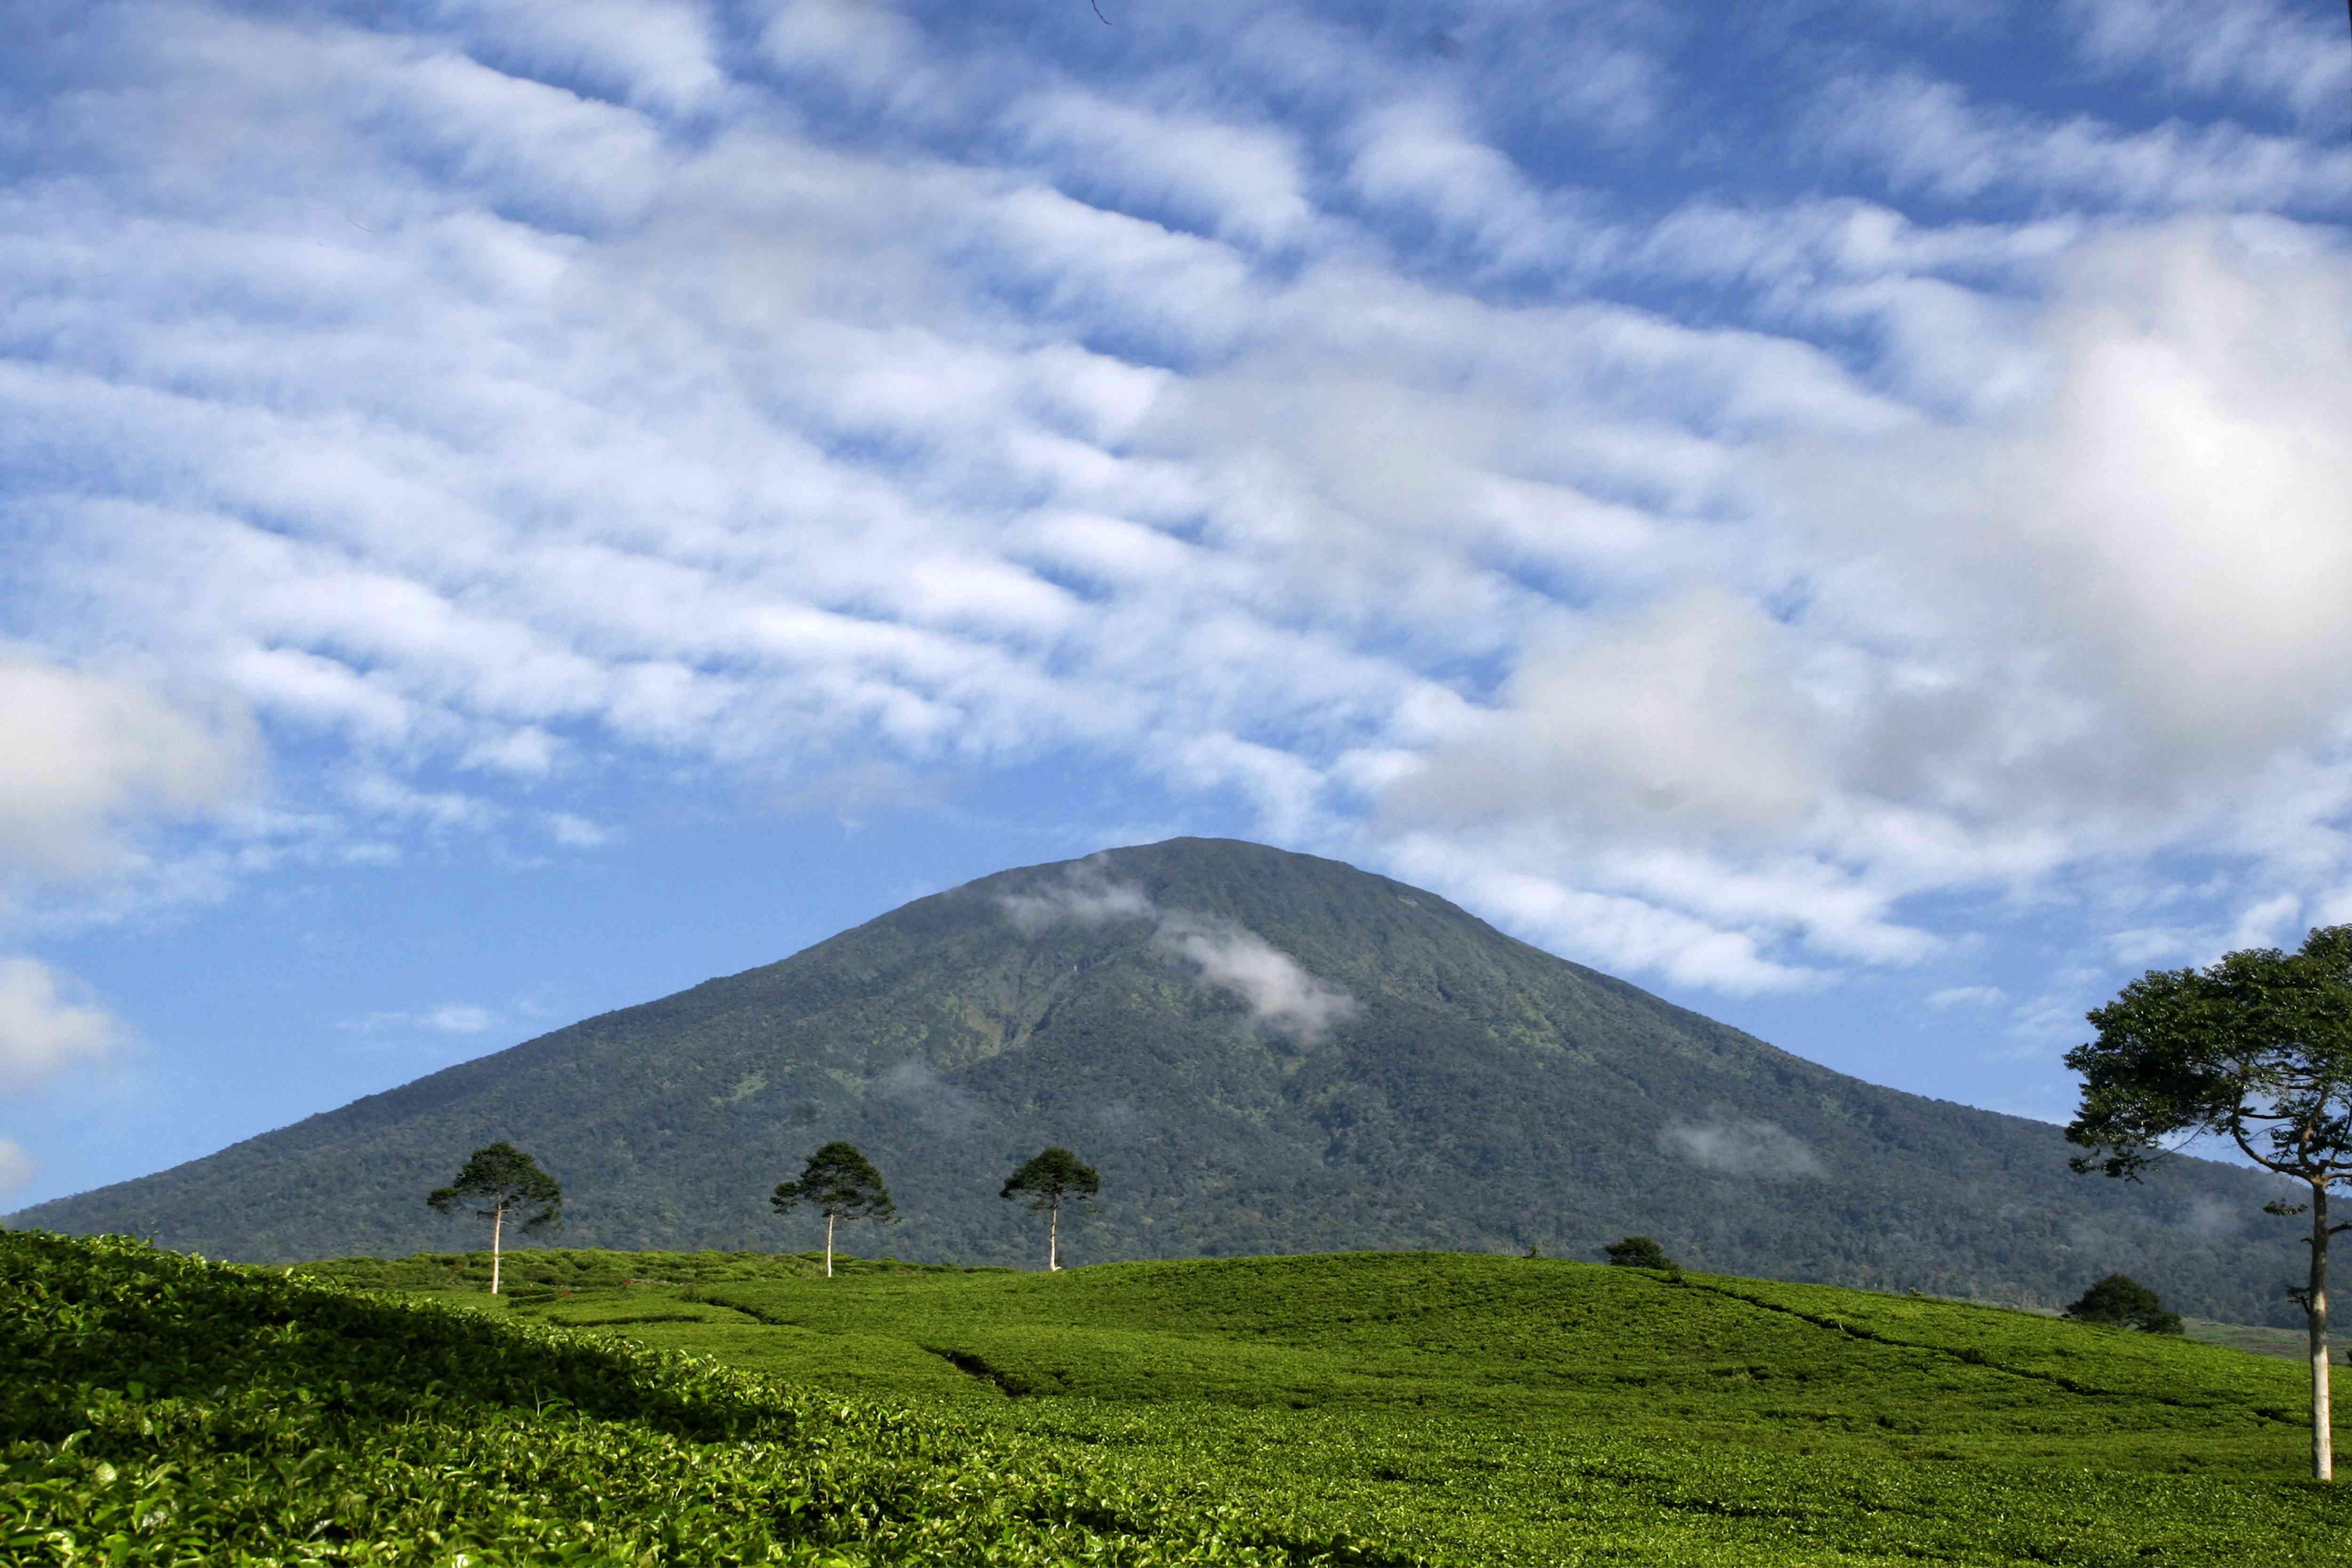 Mount Dempo and a tea plantation in Pagar Alam, Sumatra